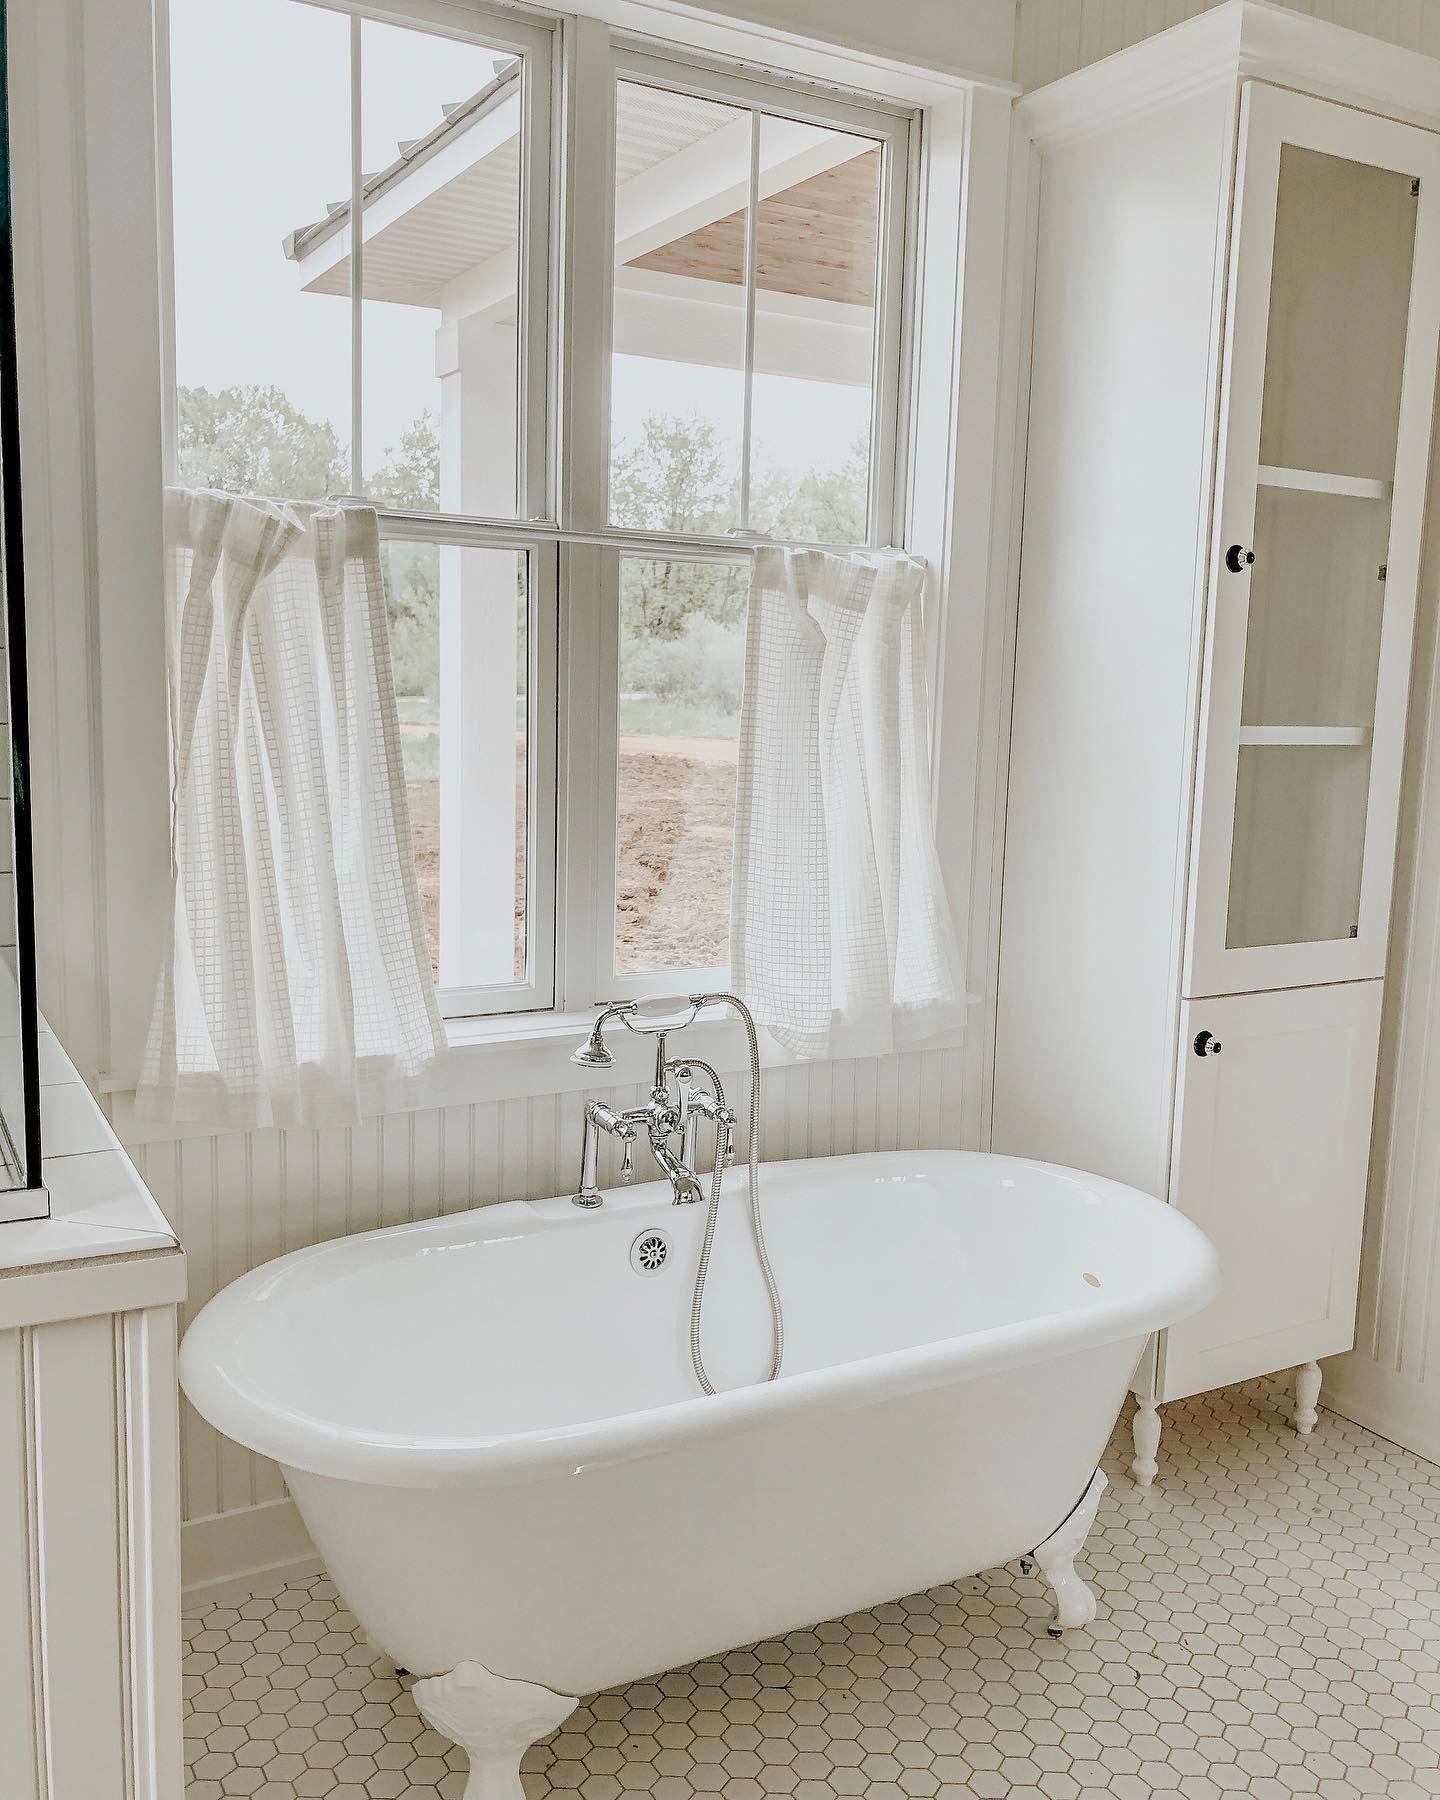 #whitetiledbathroom in 2020 | Farmhouse bathroom decor ... on Farmhouse Bathroom Tile  id=71778